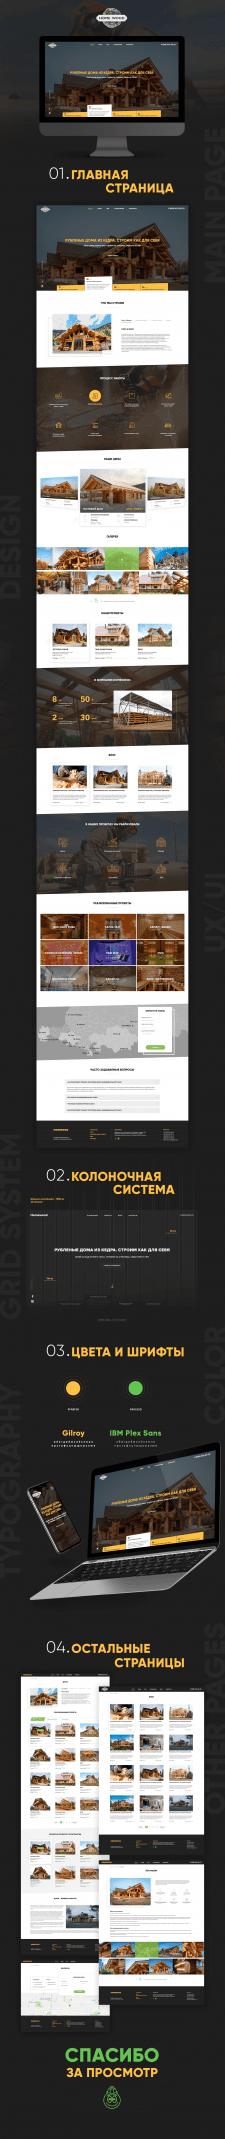 HomeWoodSPA - корпоративный сайт